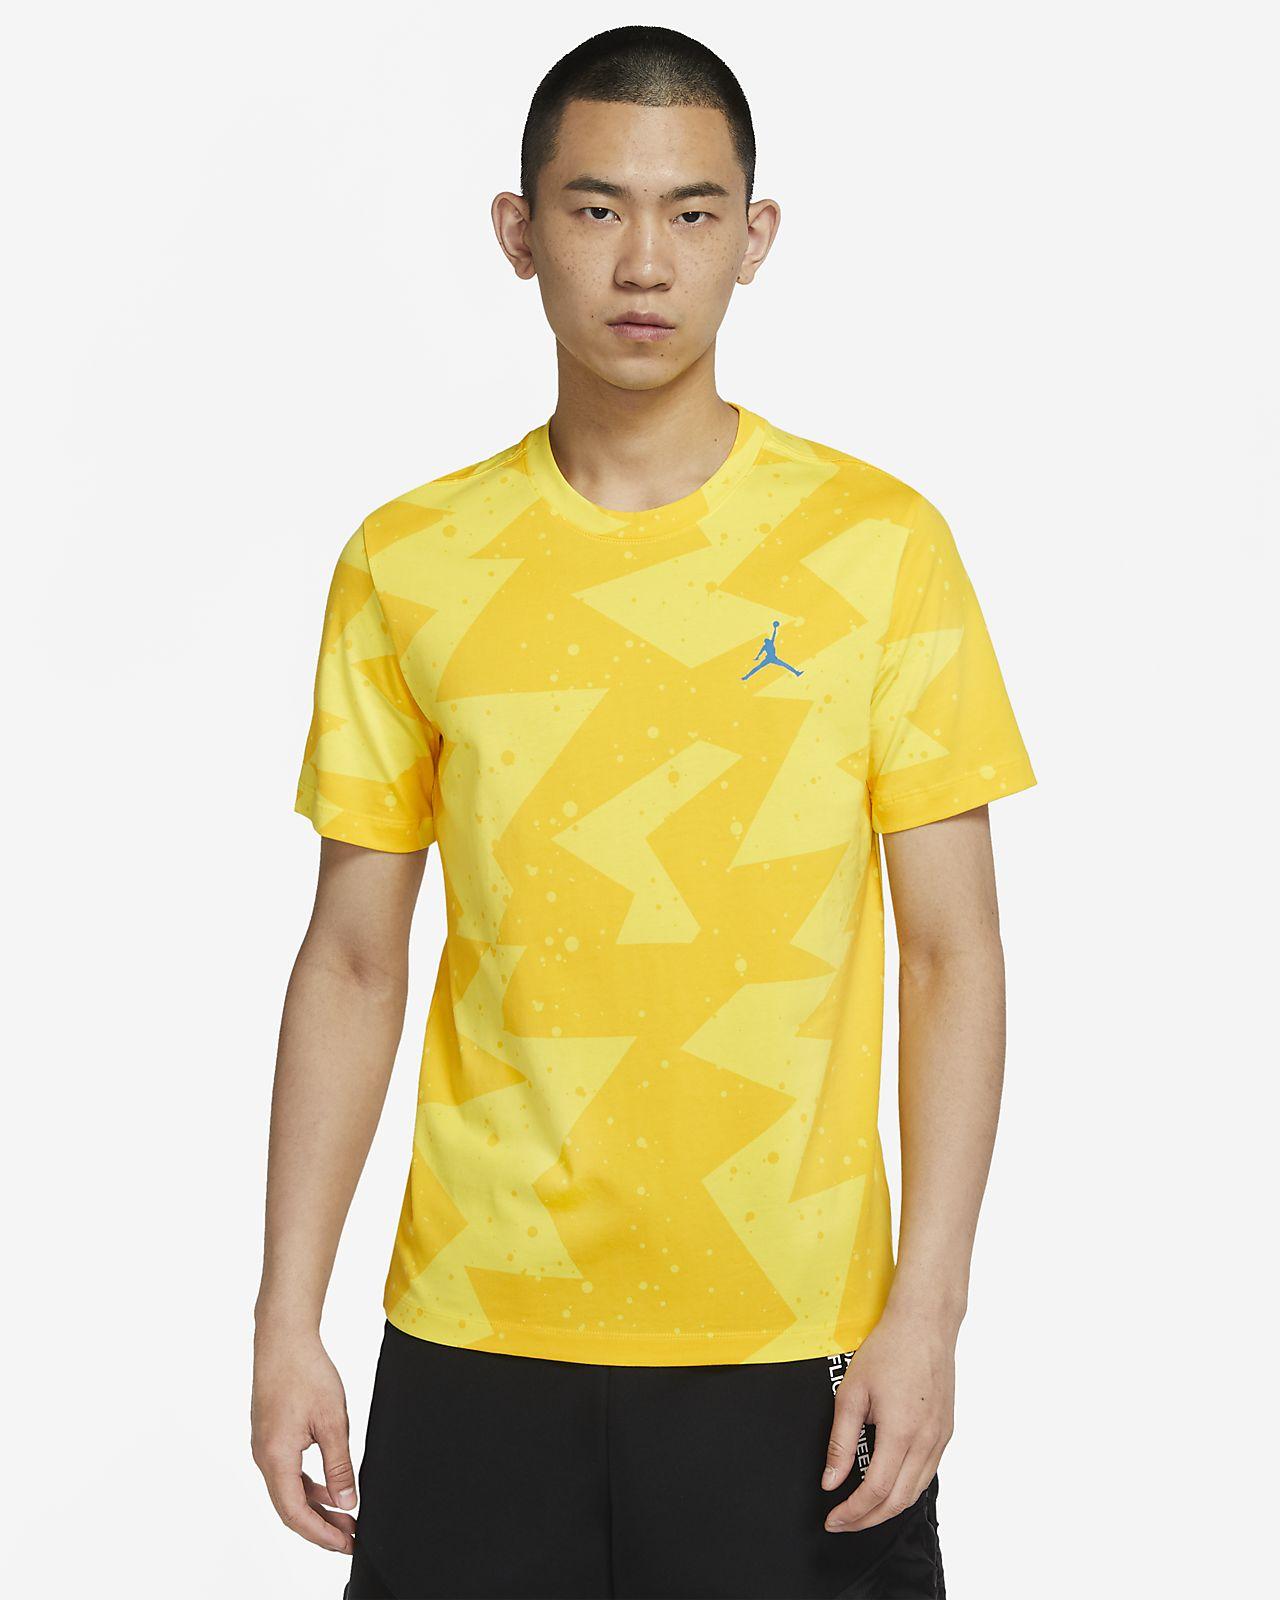 Jordan Printed Poolside 男子T恤